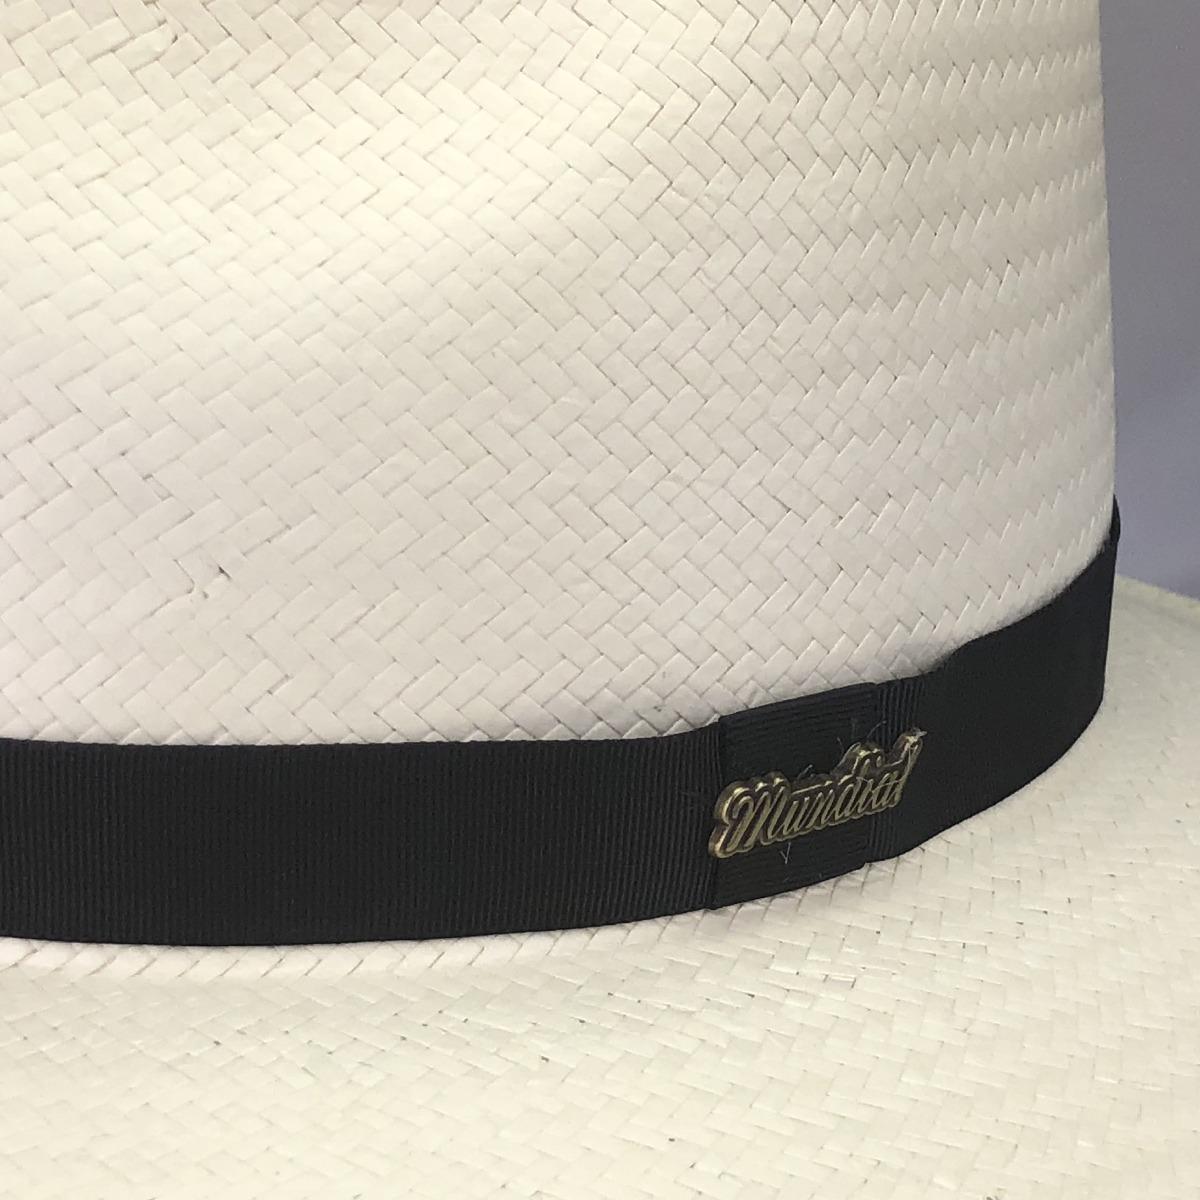 chapéu moda panamá masculino feminino aba larga promoção. Carregando zoom. ff29df3fa56